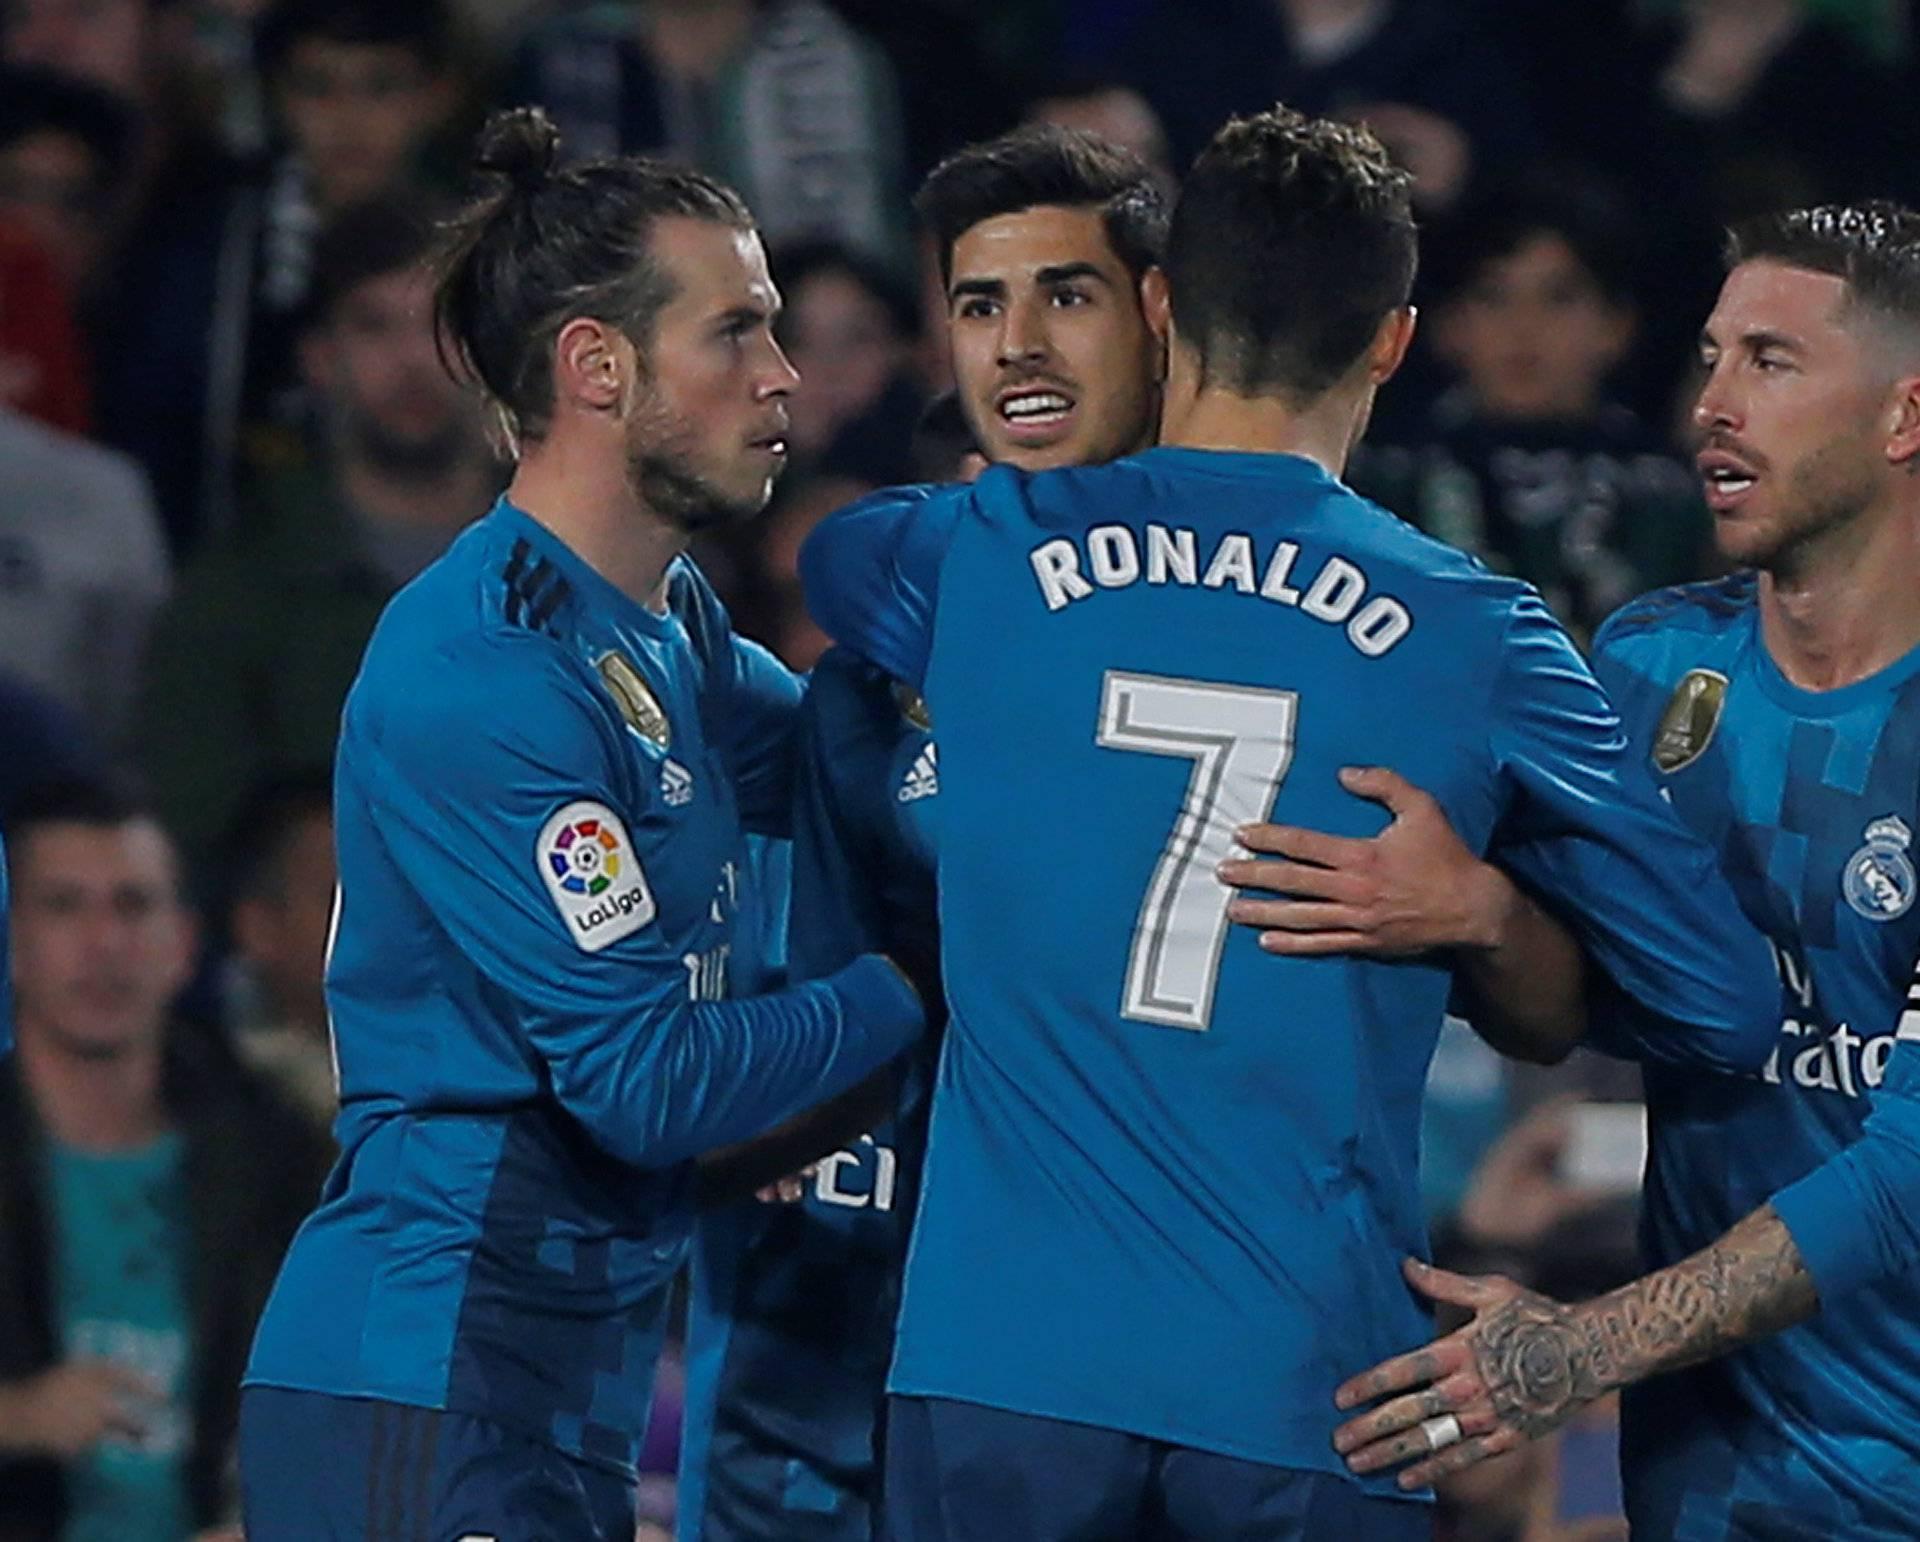 La Liga Santander - Real Betis vs Real Madrid